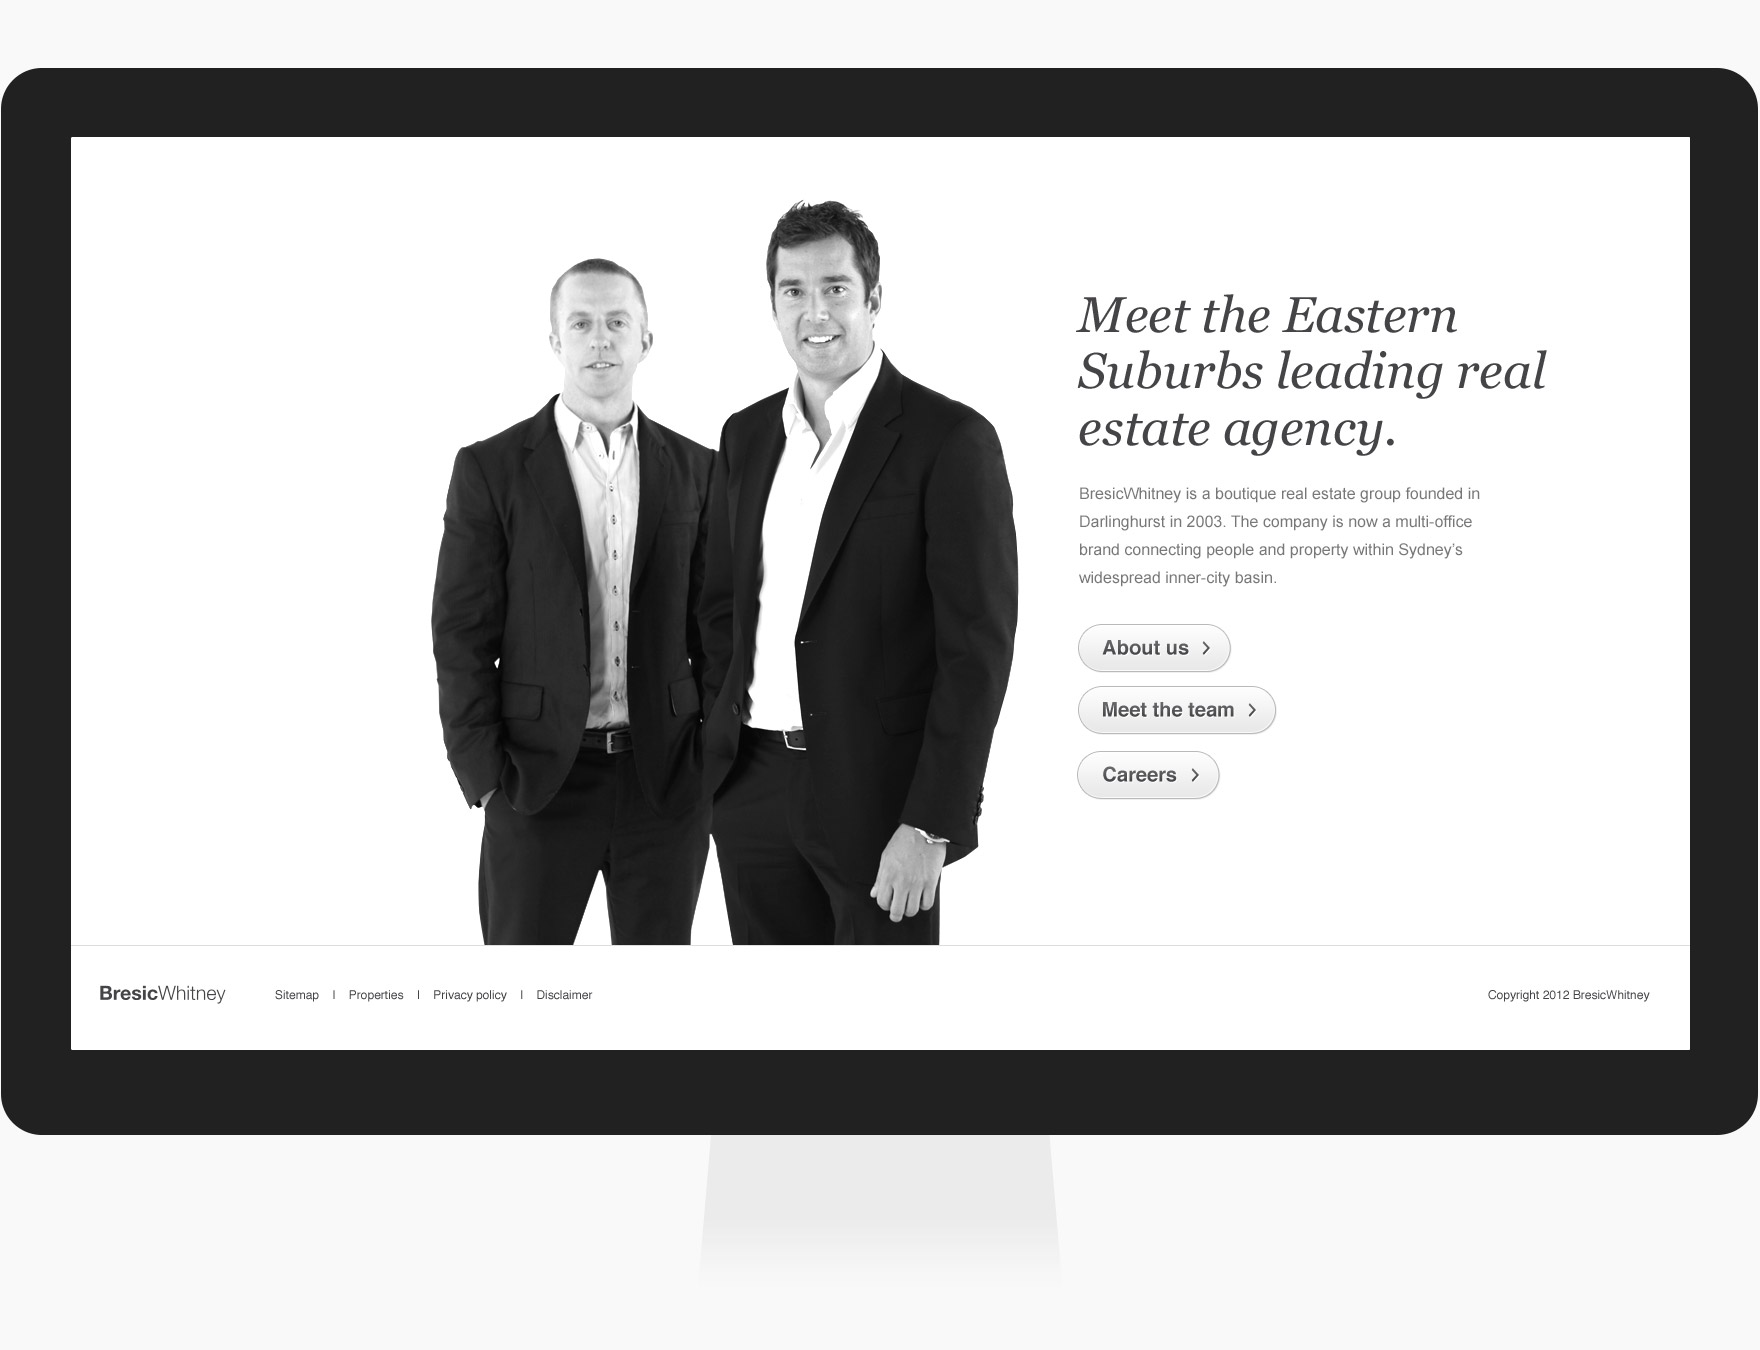 BresicWhitney: leaders in the Sydney Eastern Suburbs